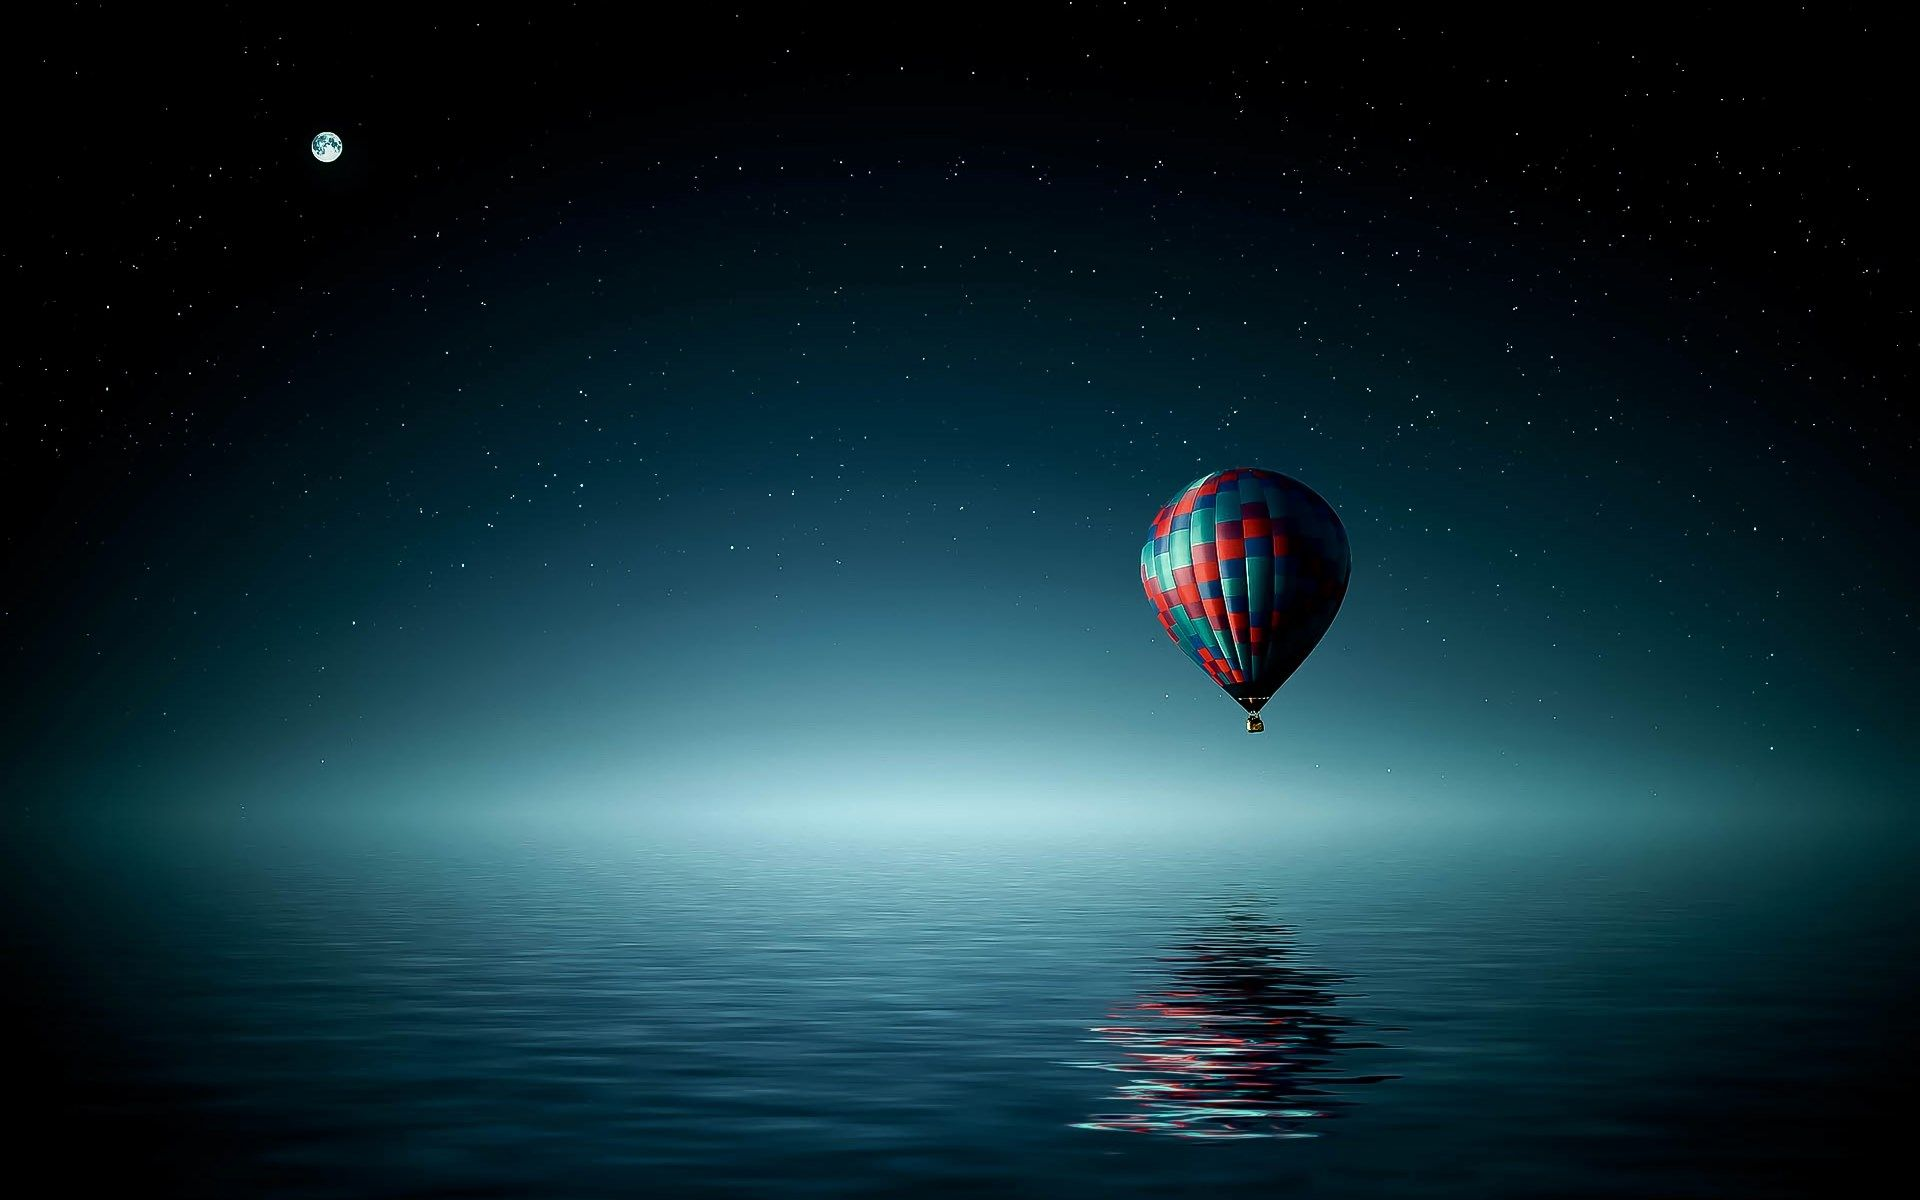 Top Wallpaper Night Hot Air Balloon - 29b58e58ad402949f319cb34ef8a7b0f  2018-232433.jpg